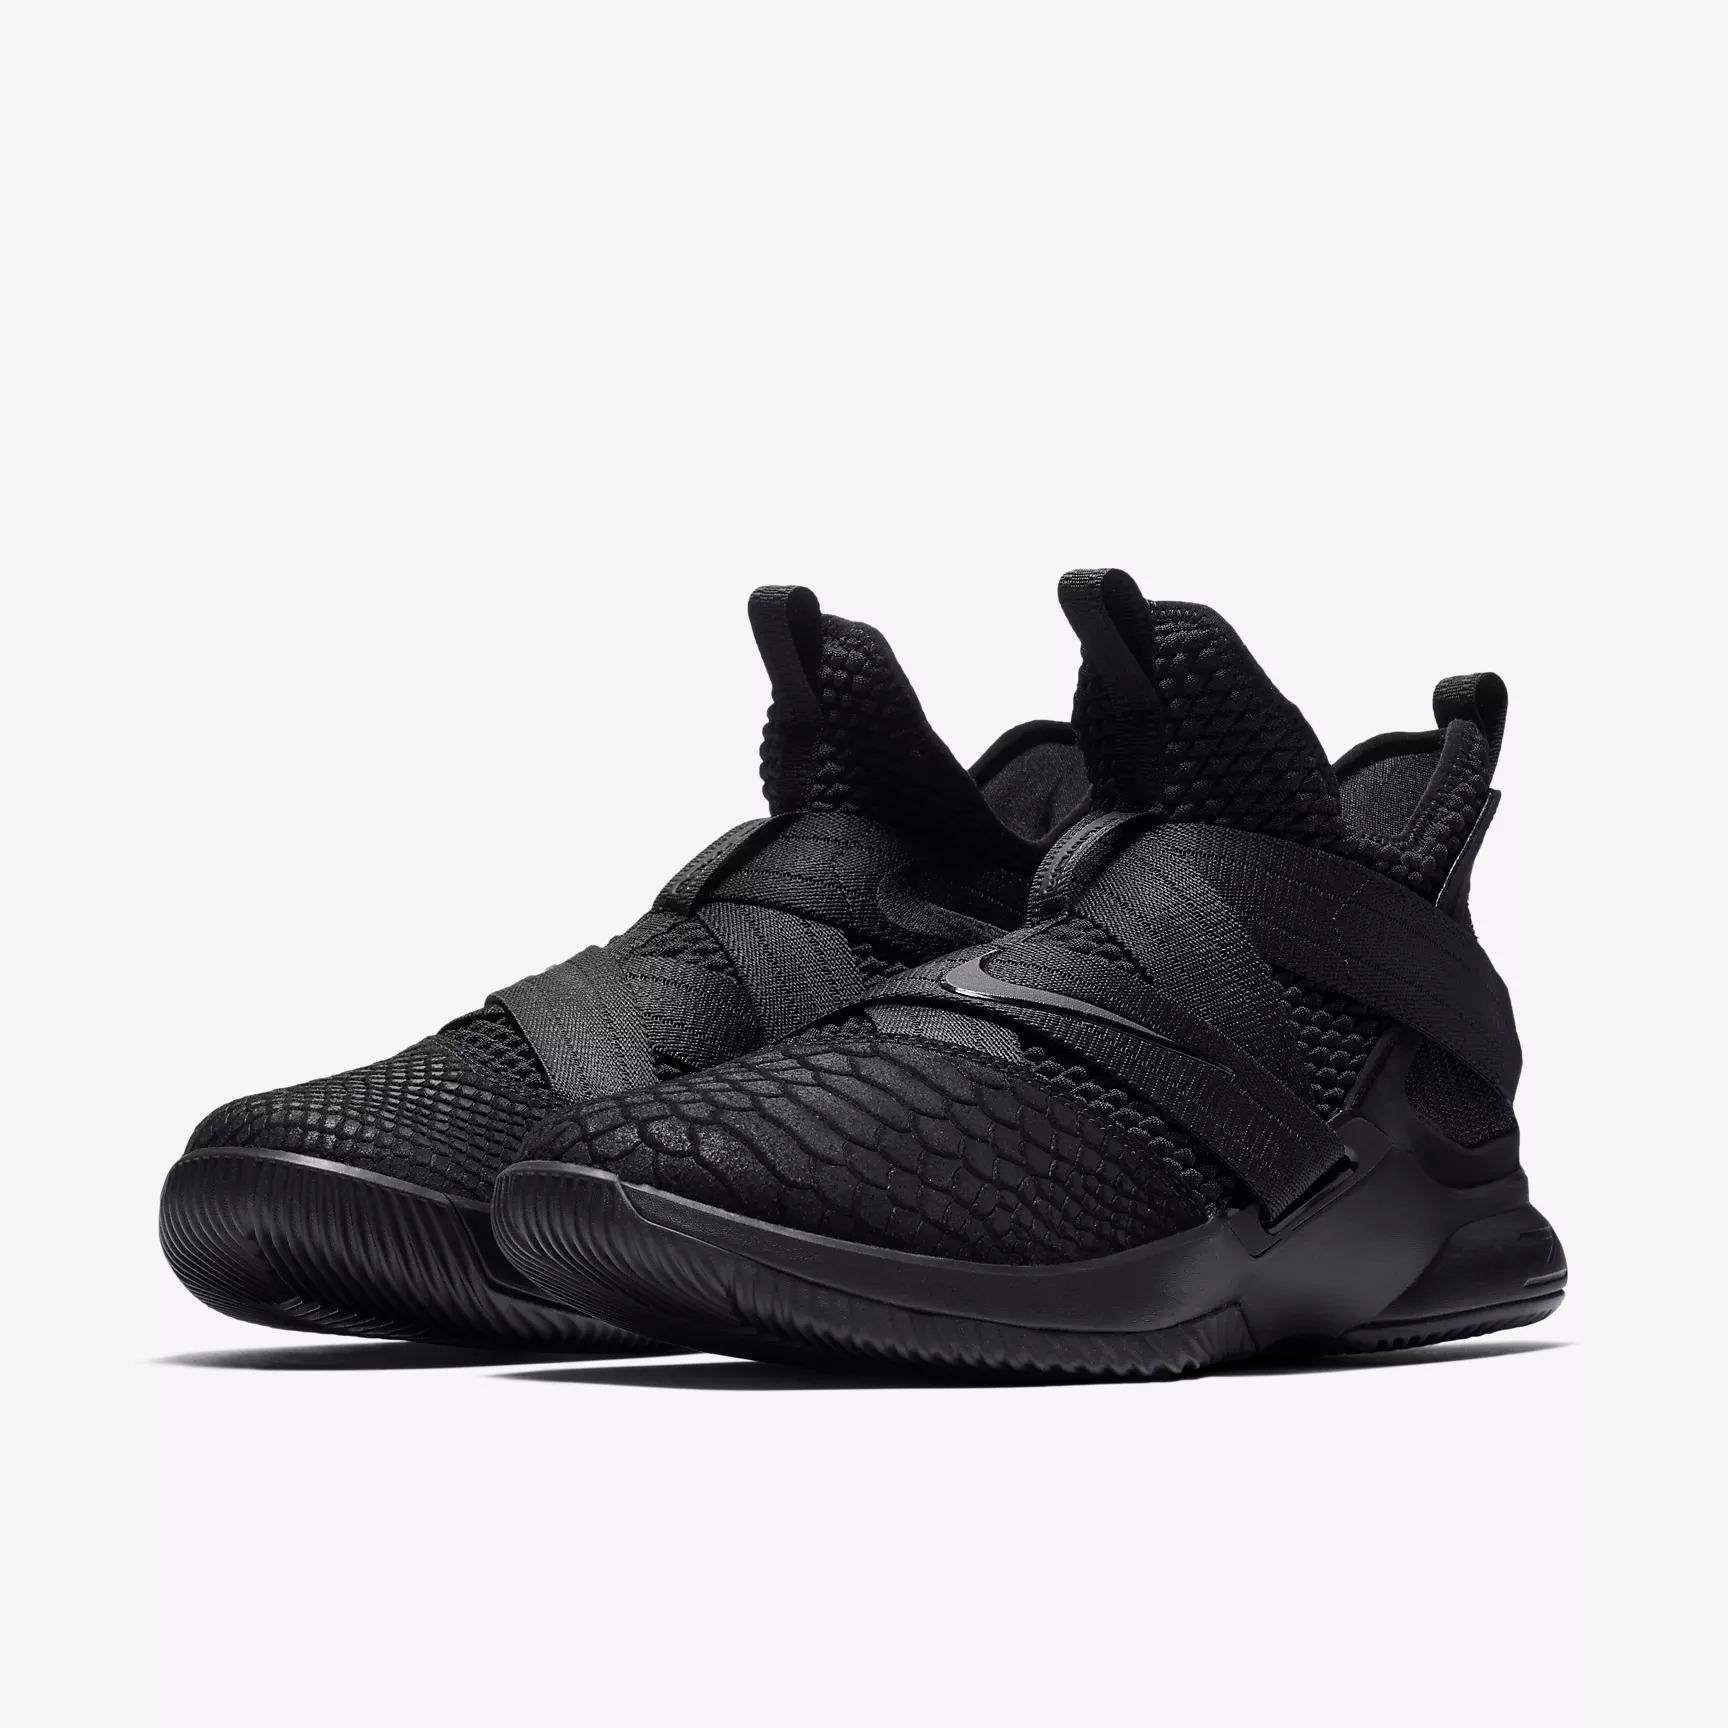 reputable site 0bb98 308f9 ... ebay nike lebron soldier xii sfg triple black basketball shoes fd3a3  55fc6